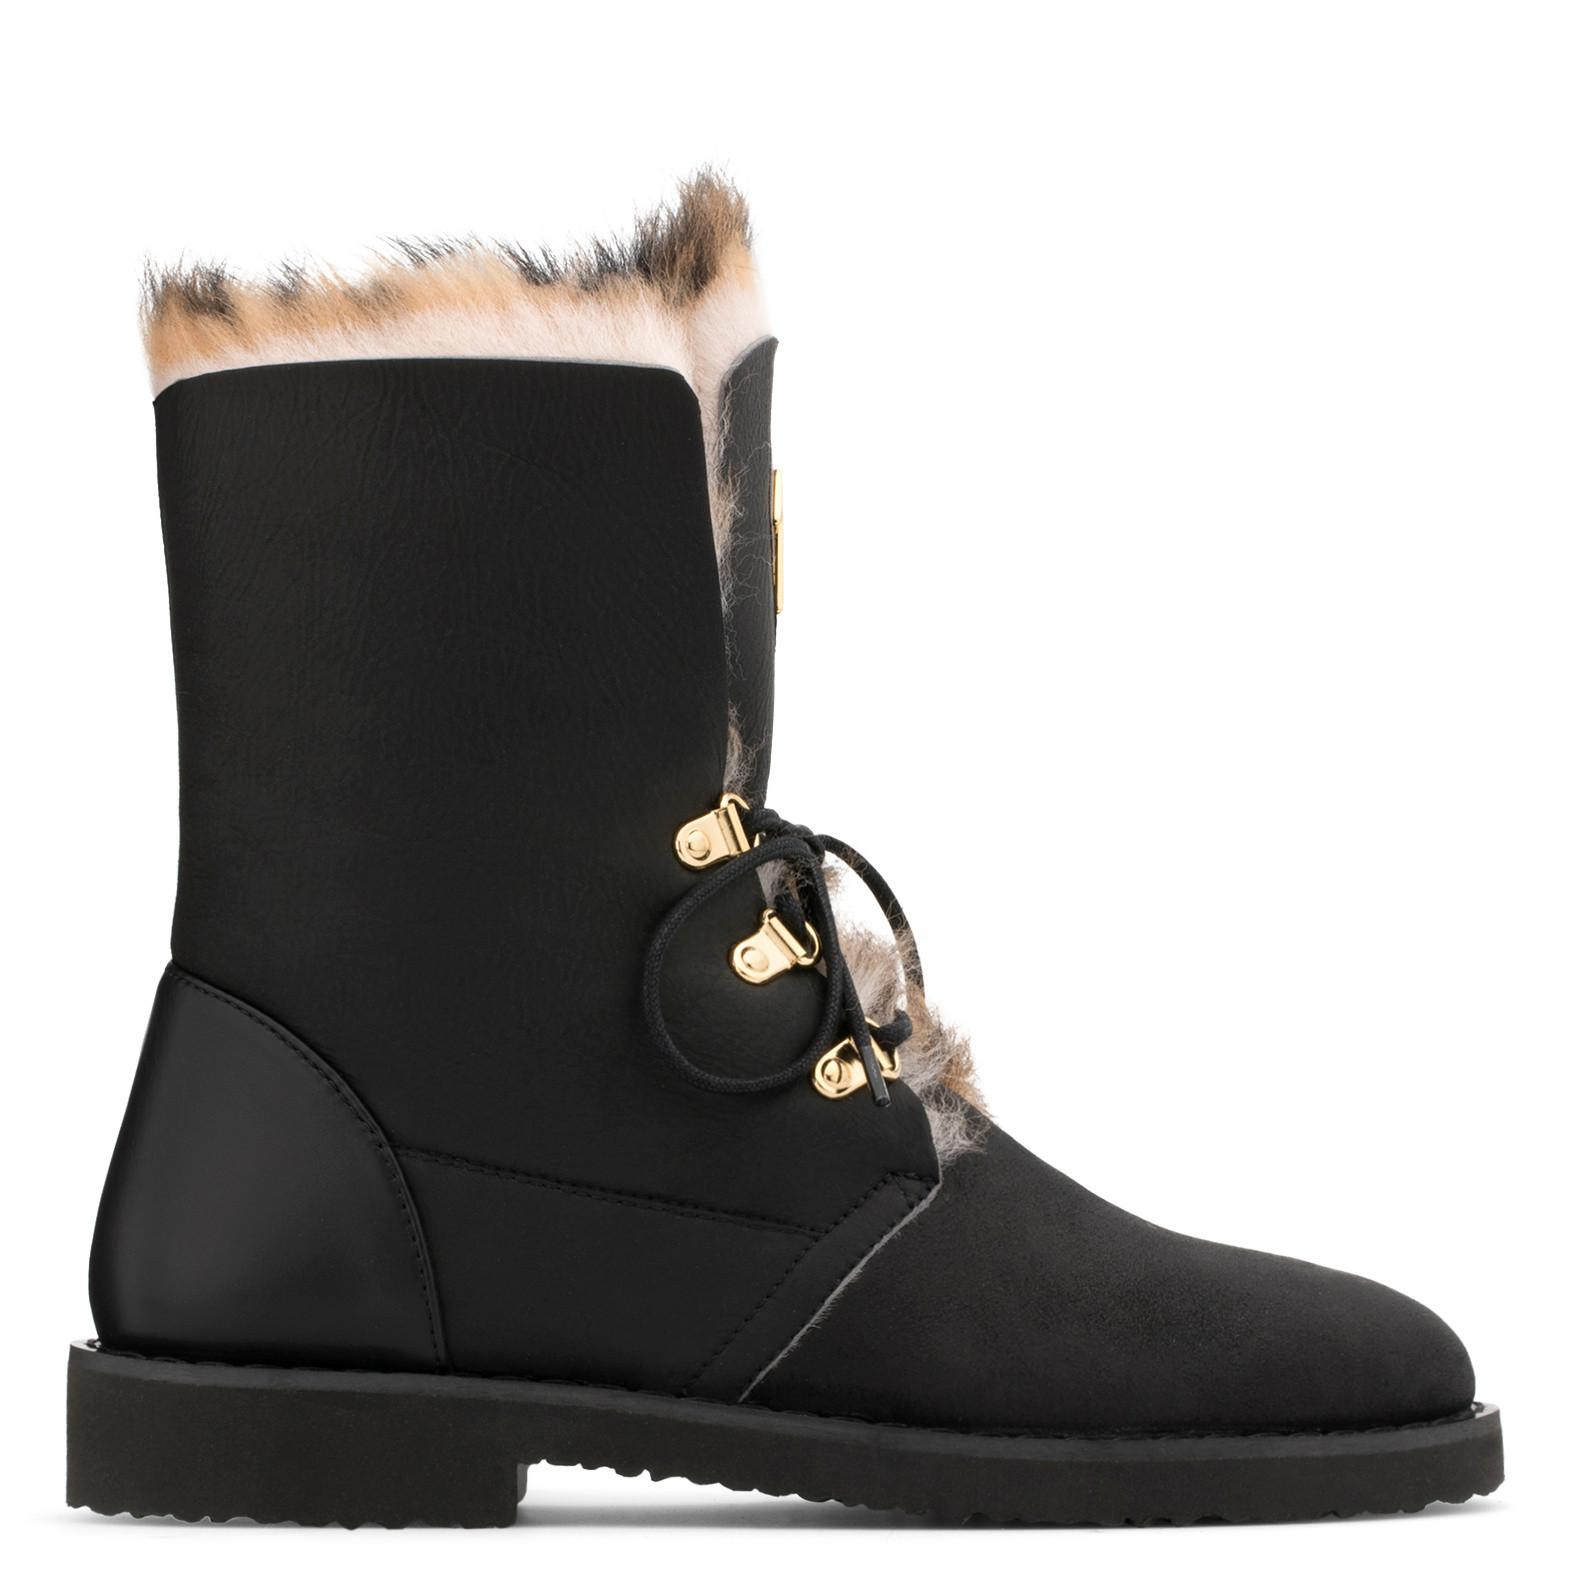 Giuseppe Zanotti Black calfskin leather boot with shearling fur inside PHILLIS g61lc9KI6j